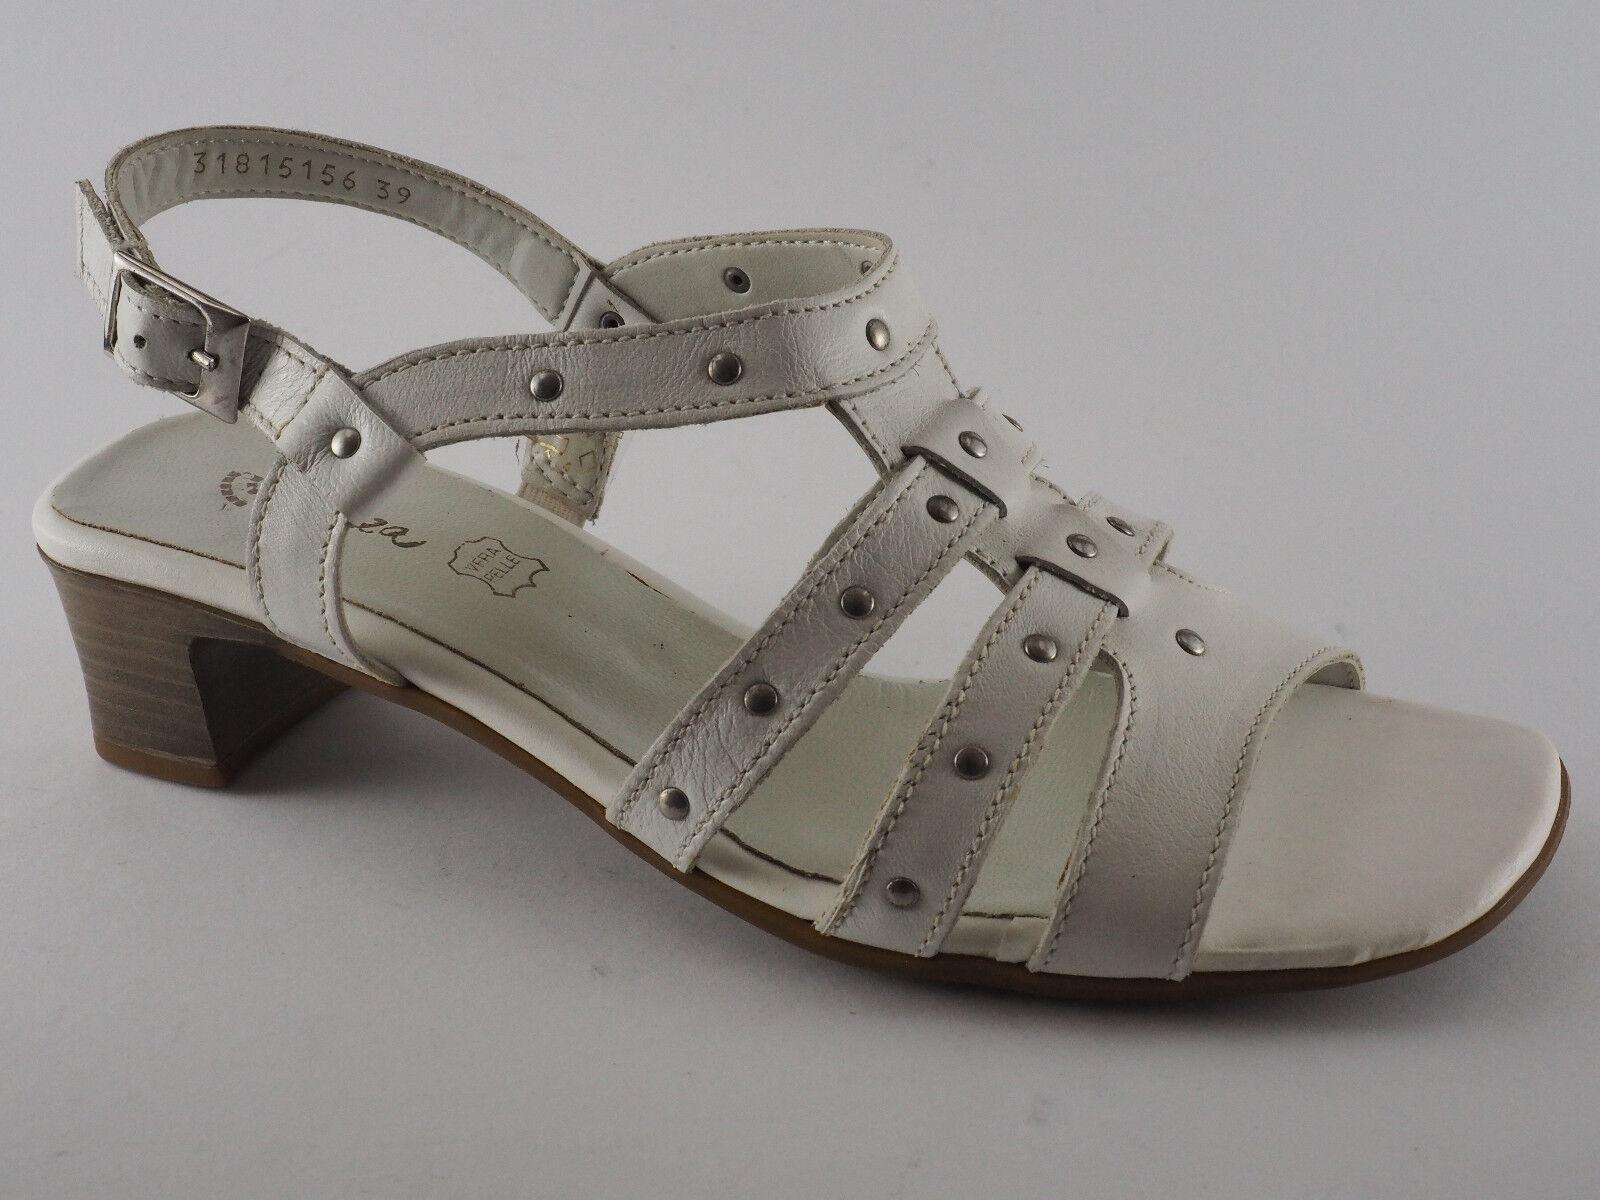 Schuhe Damen Pumps PIAZZA NEU Weiß Leder Sandaletten 2 1 39